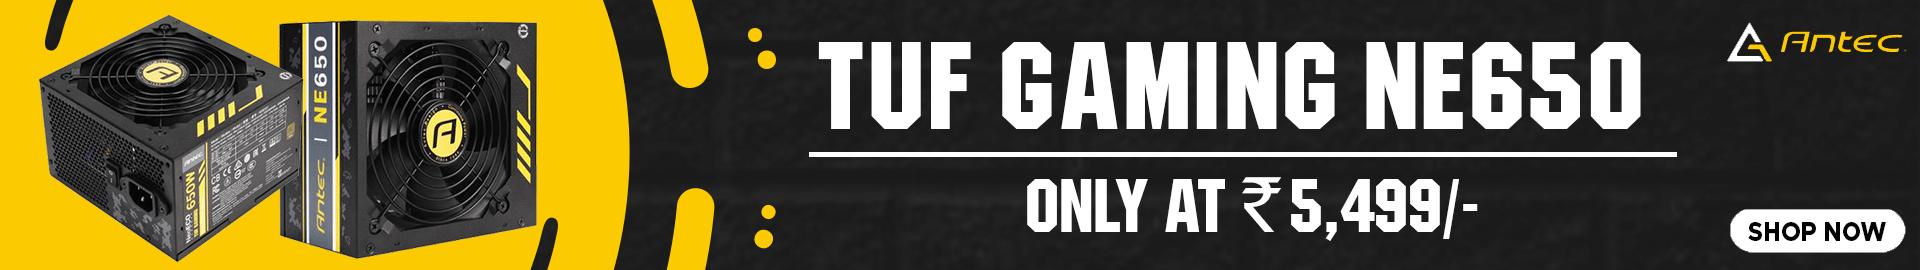 Buy Antec Tuf Gaming NE650 at Best Price In India